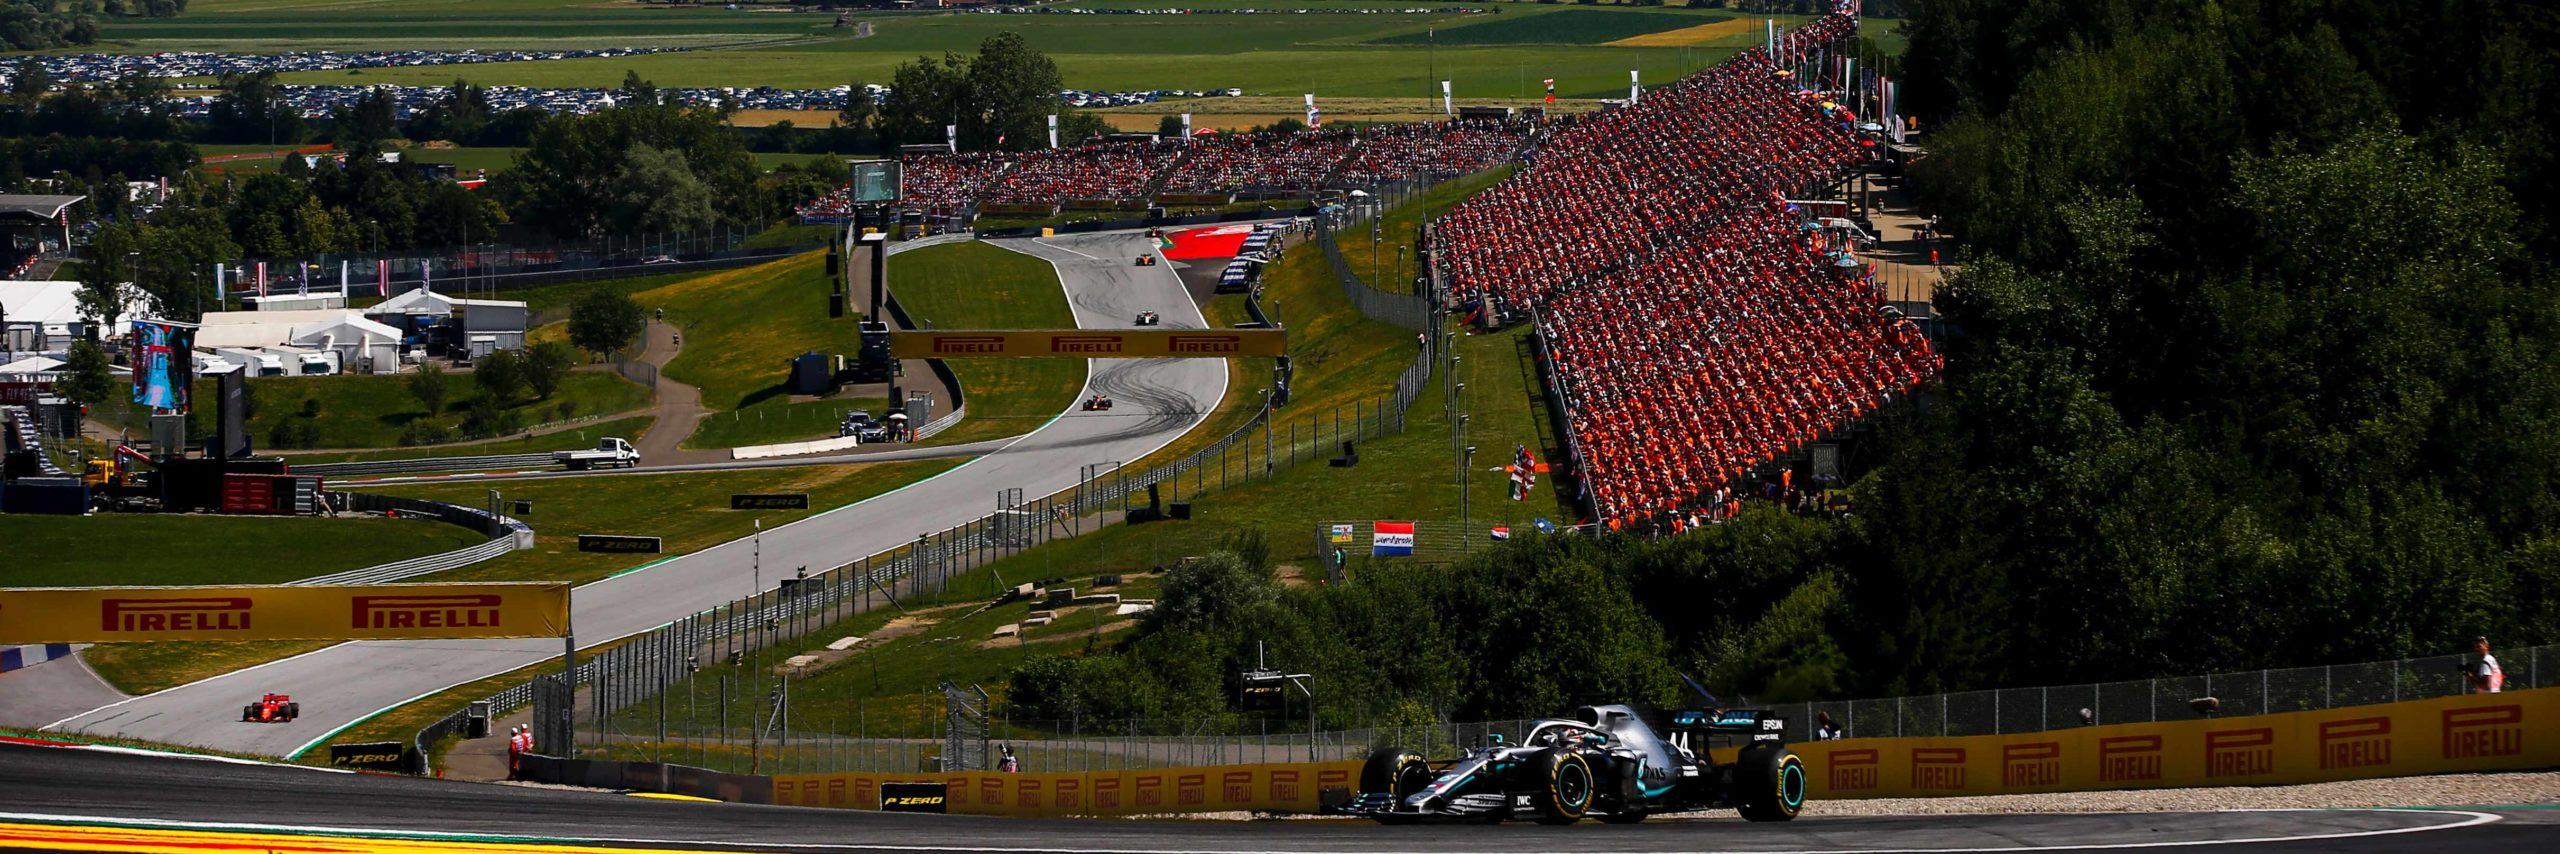 Formula 1 Austrian Grand Prix slide 2